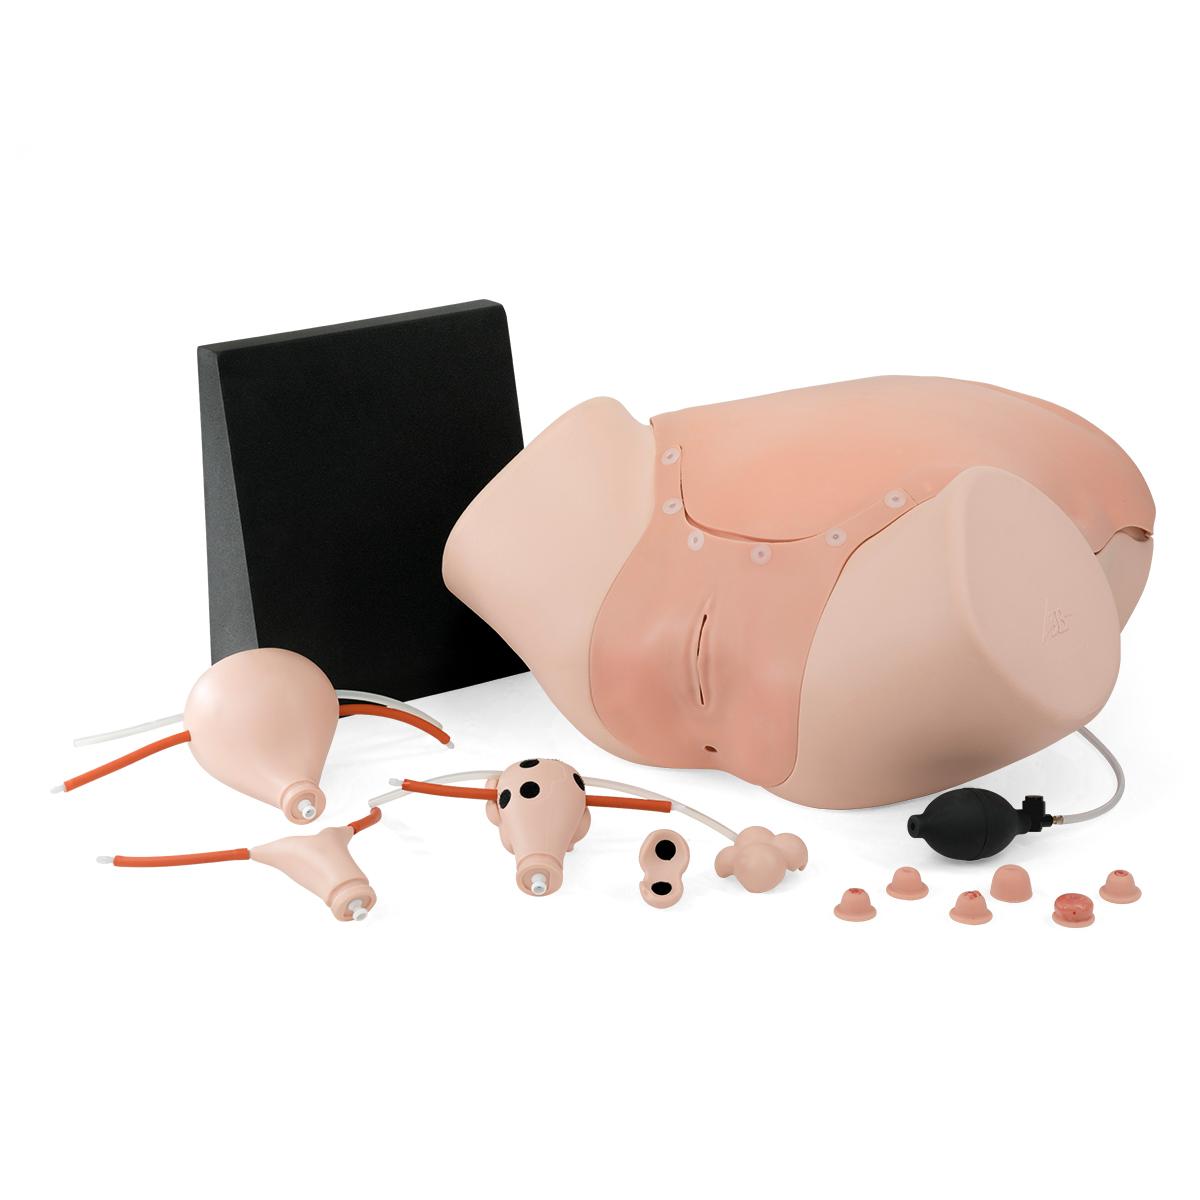 Gynecologic Skills Trainer P91